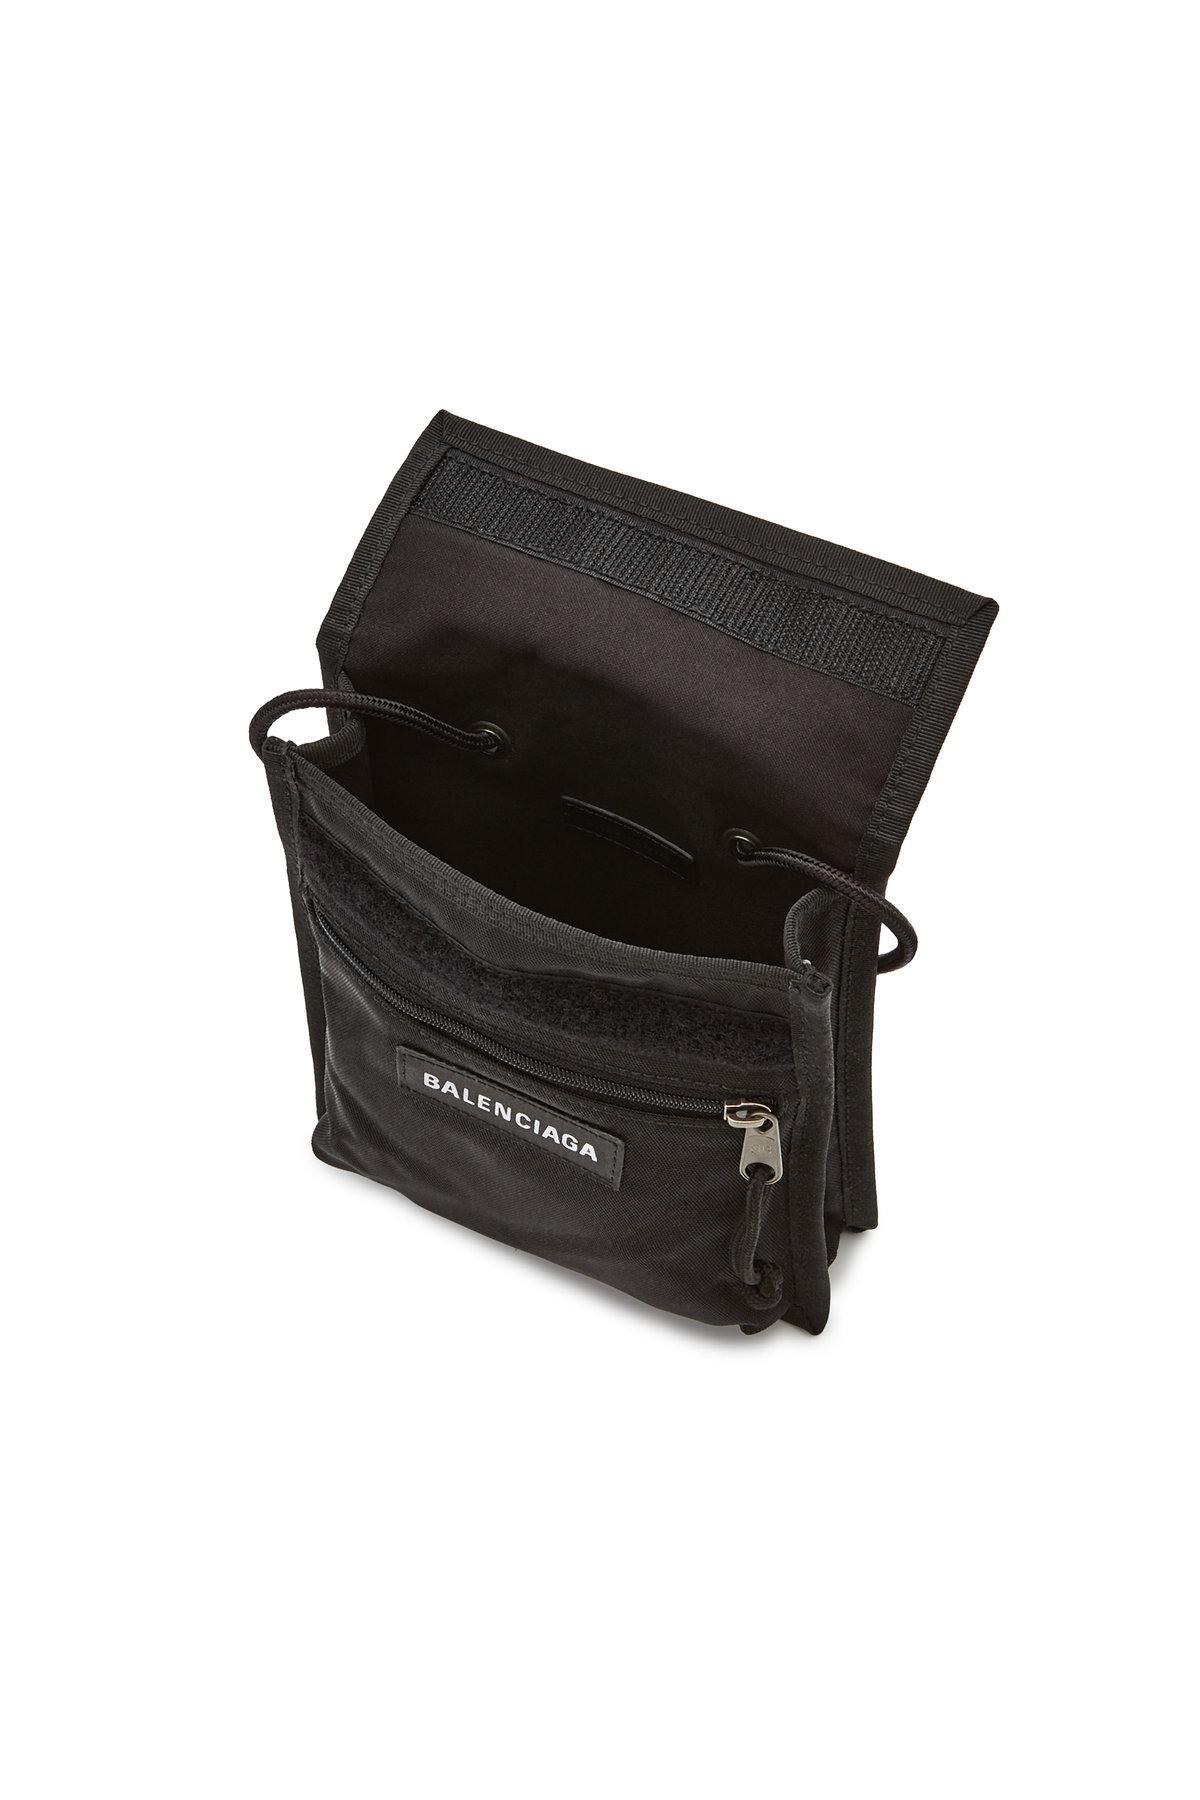 f7bb3df6ba Balenciaga Explorer Pouch Strap in Black for Men - Lyst